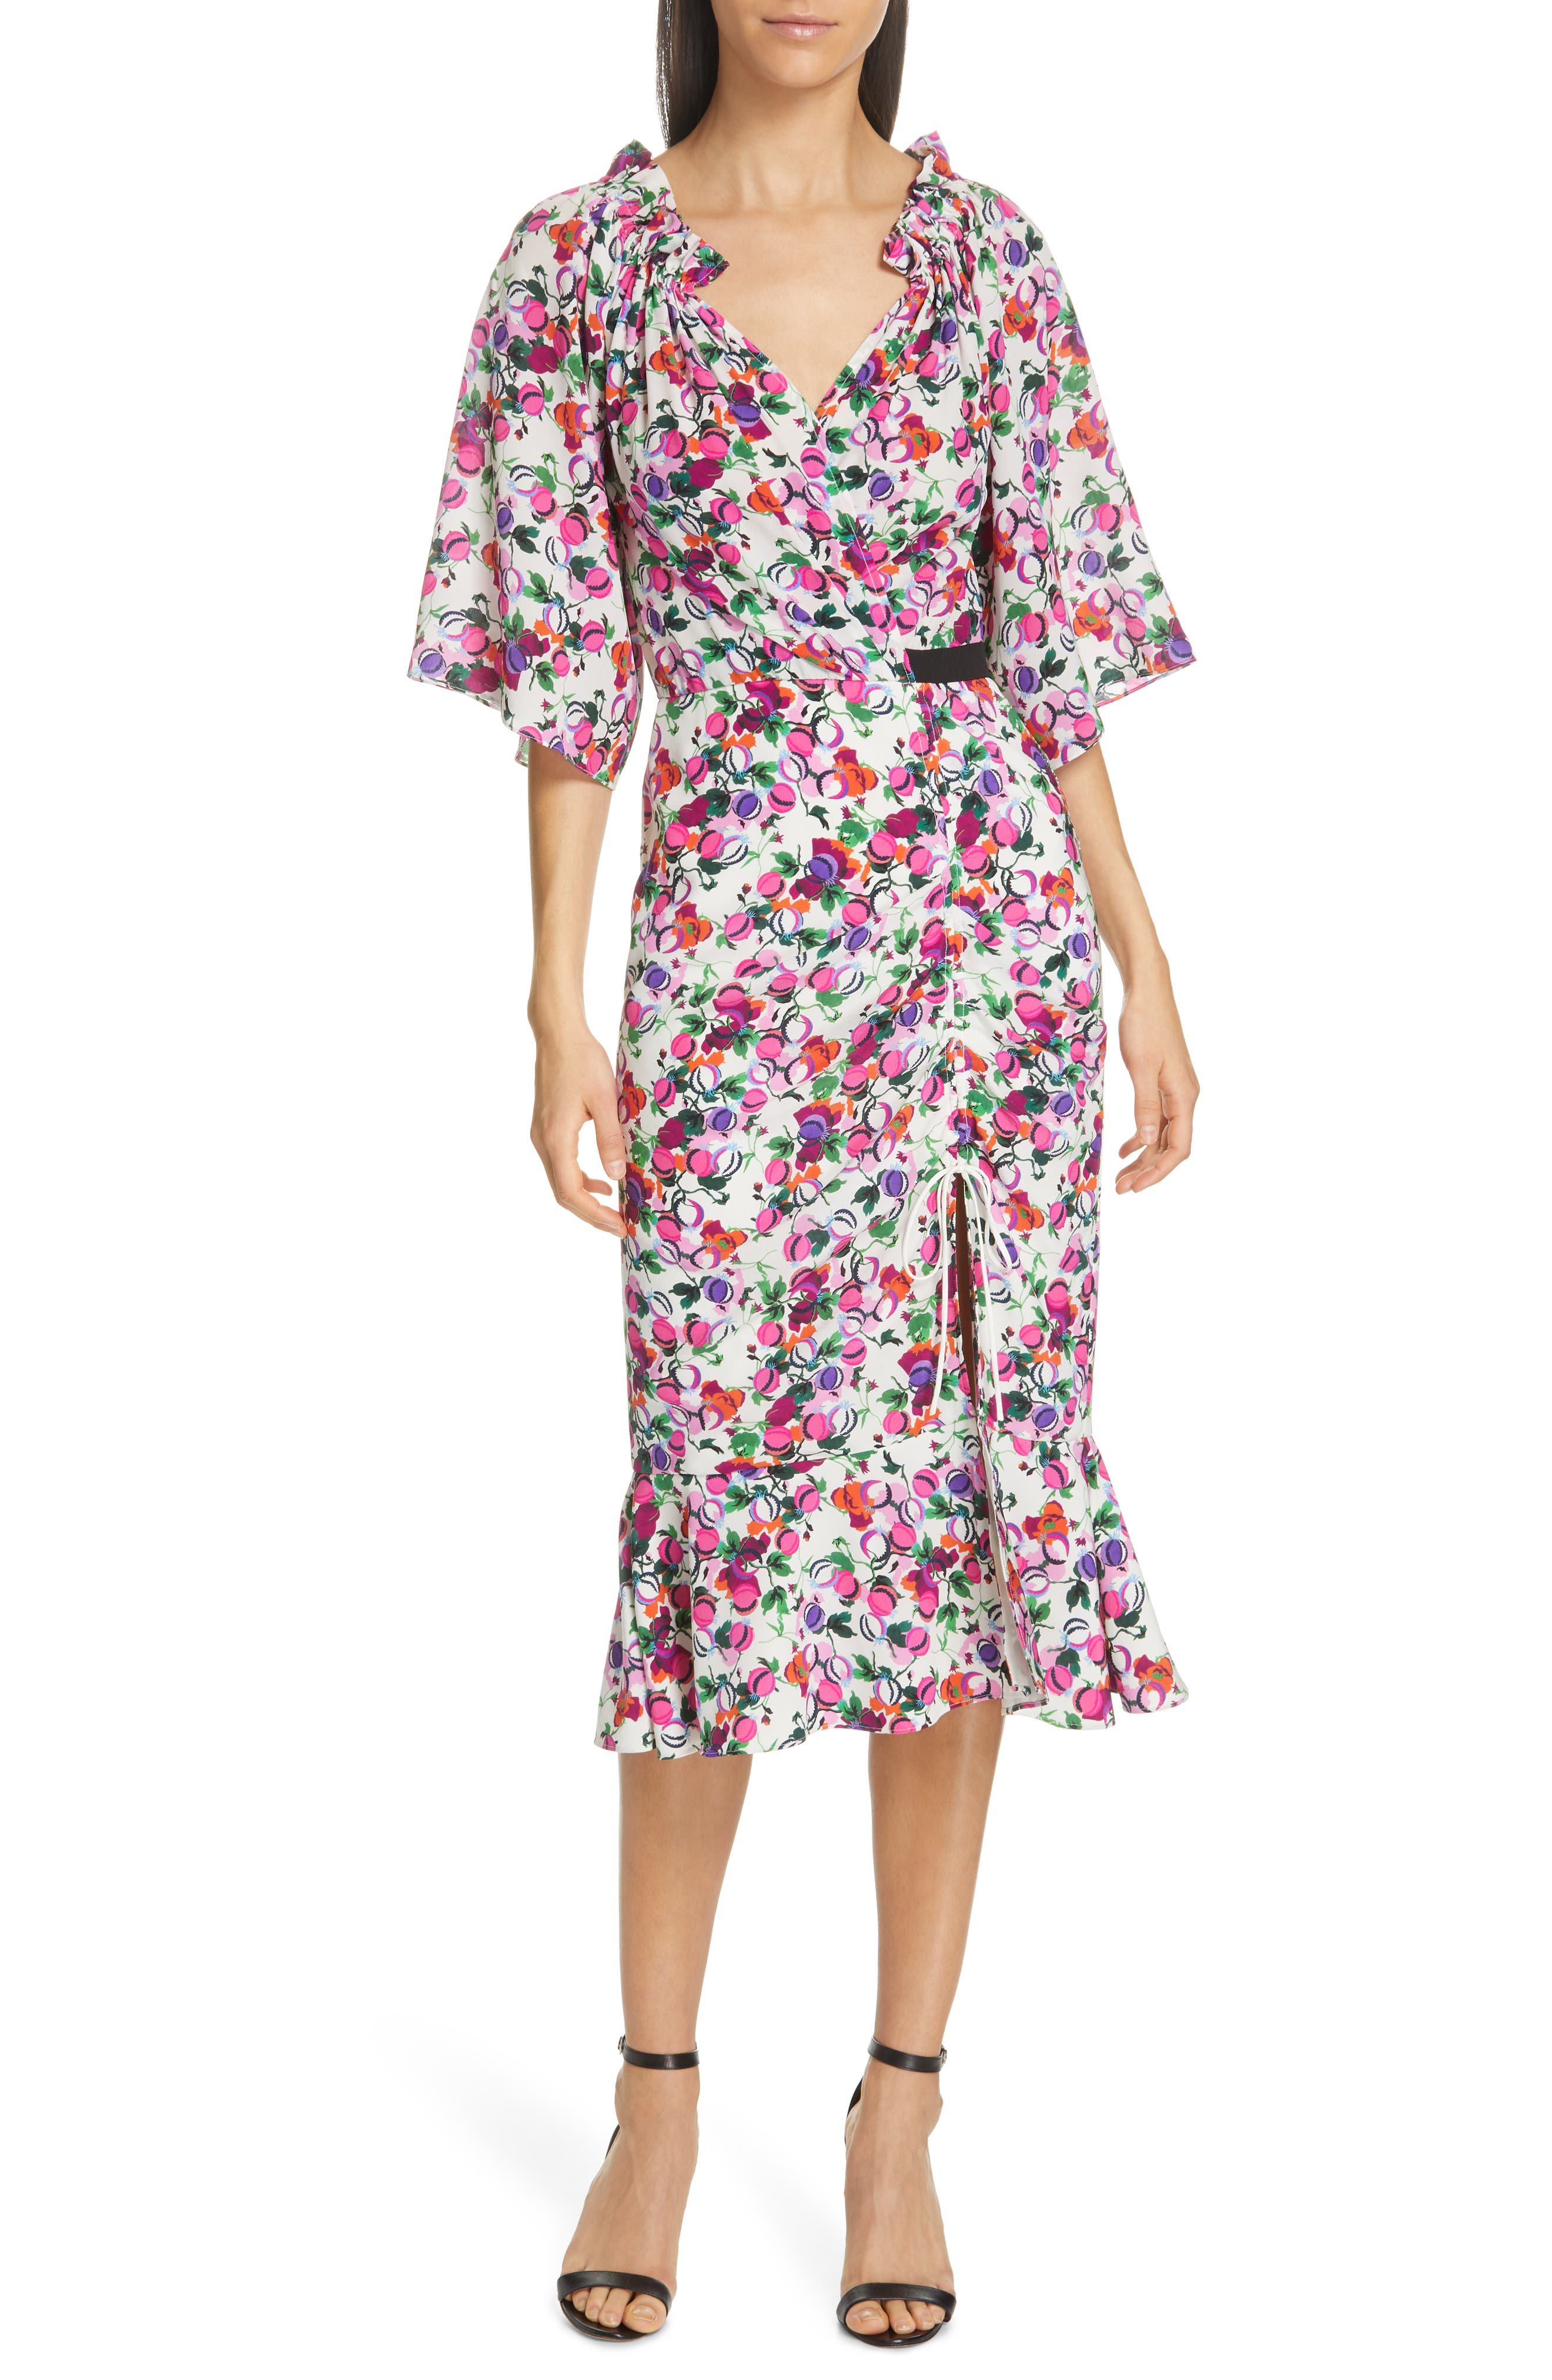 SALONI Olivia Floral Print Off the Shoulder Midi Dress, Main, color, ROSE BOUNTY BLACK